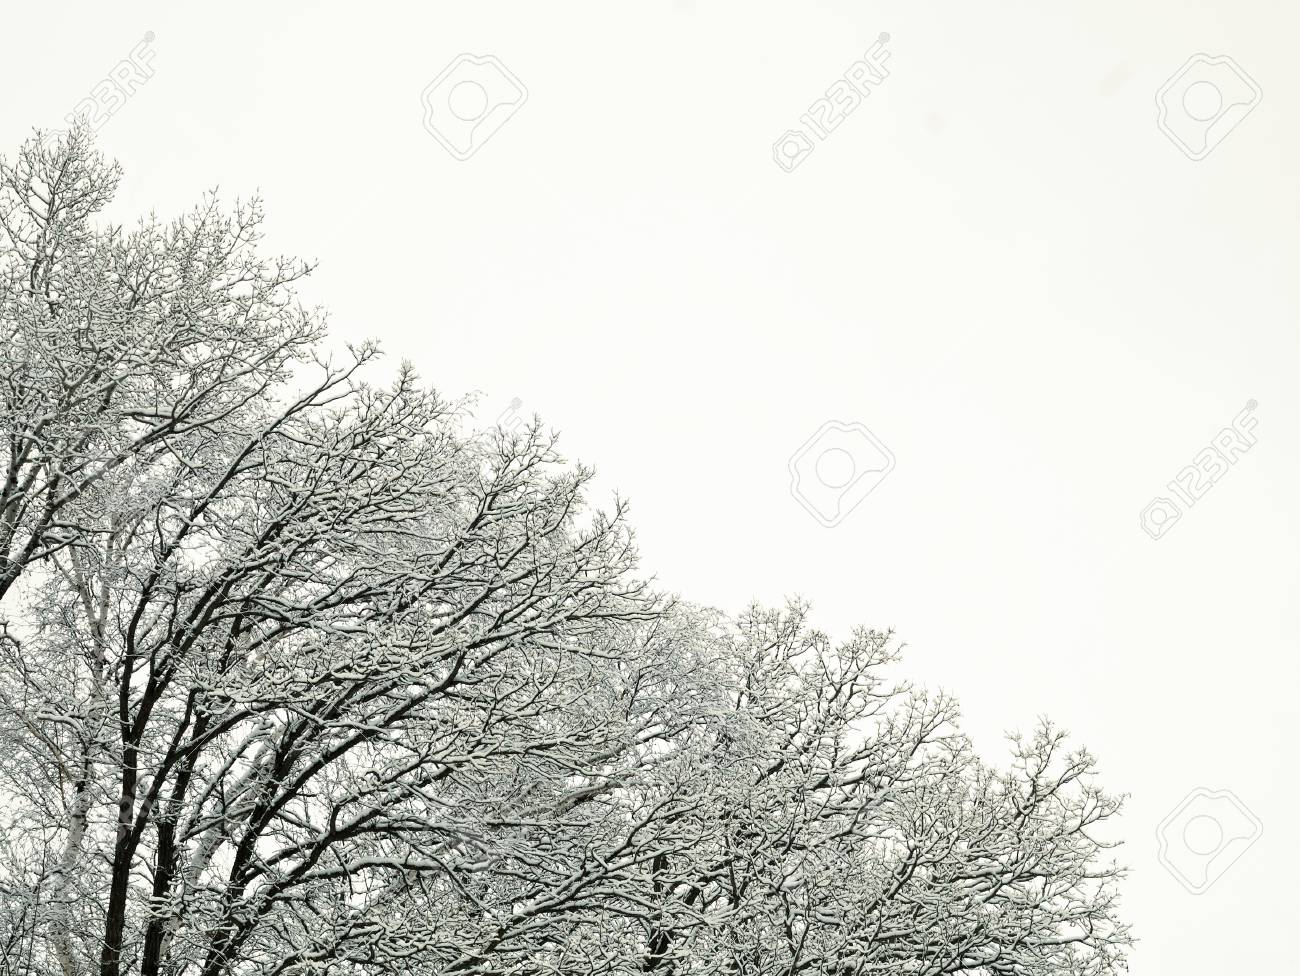 New Fresh Snow On Branches Of Trees In Winter Scene In Bemidji